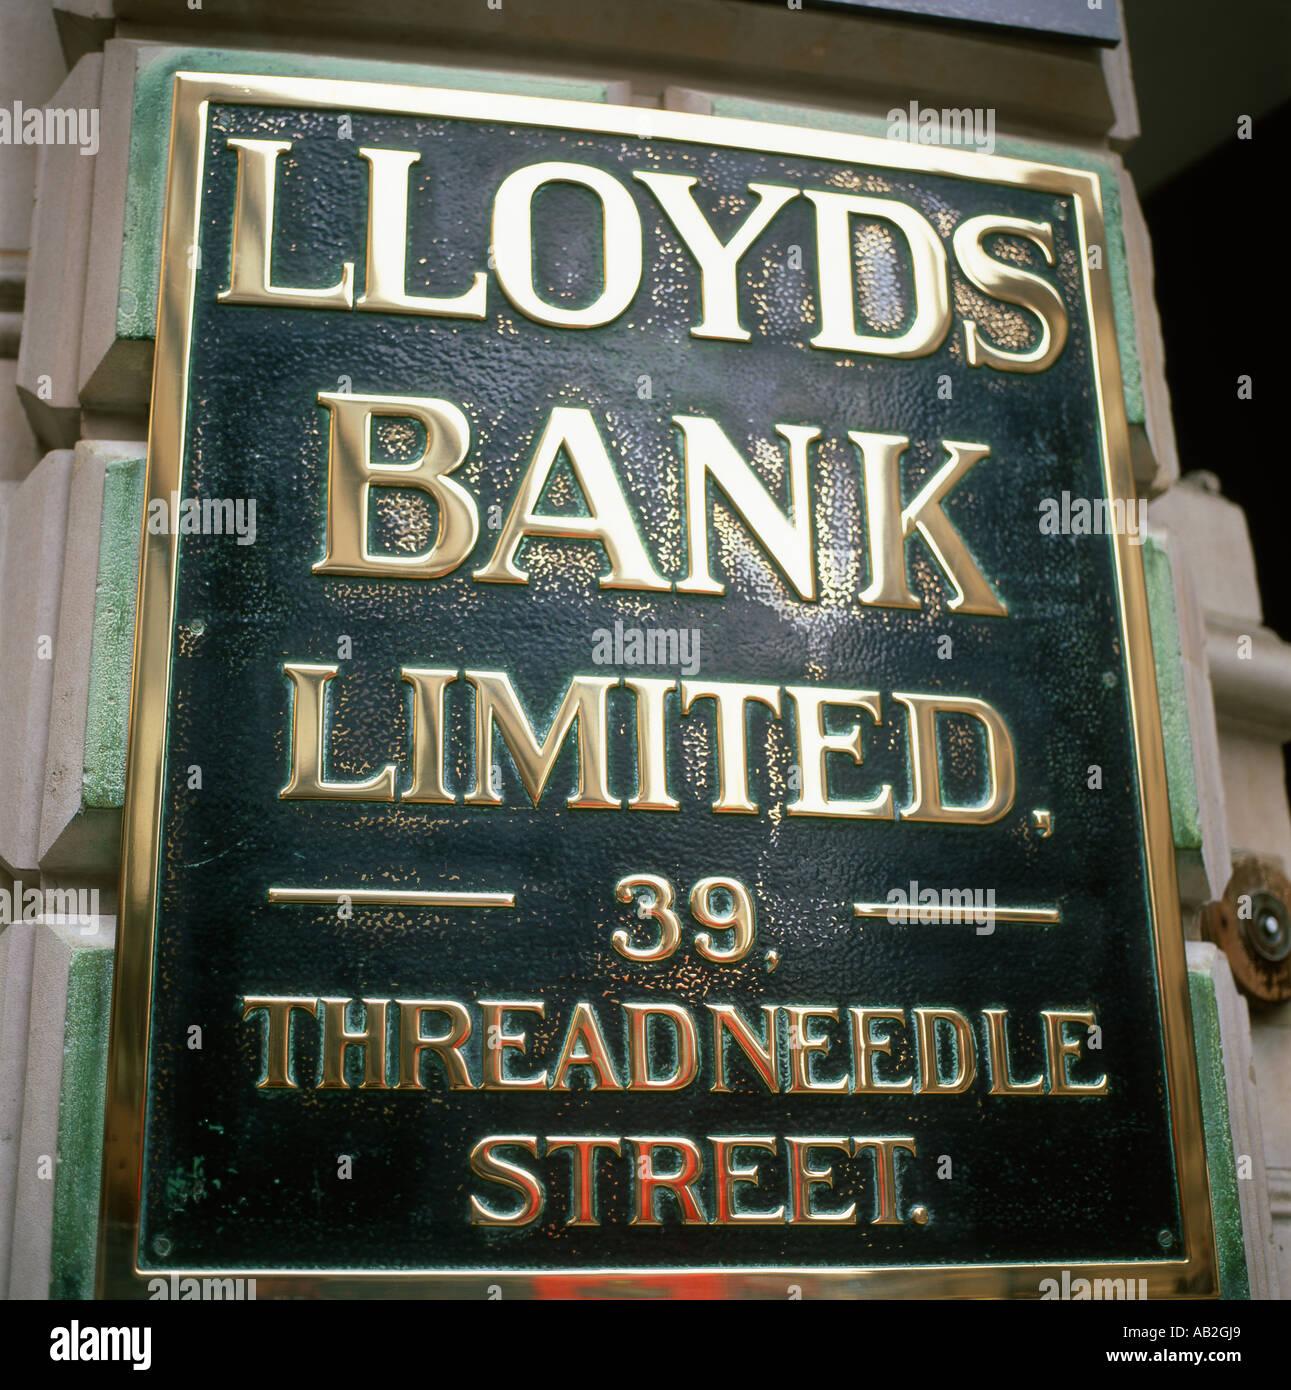 Brass Lloyds Bank sign, 39 Threadneedle Street, City of London, England, UK - Stock Image